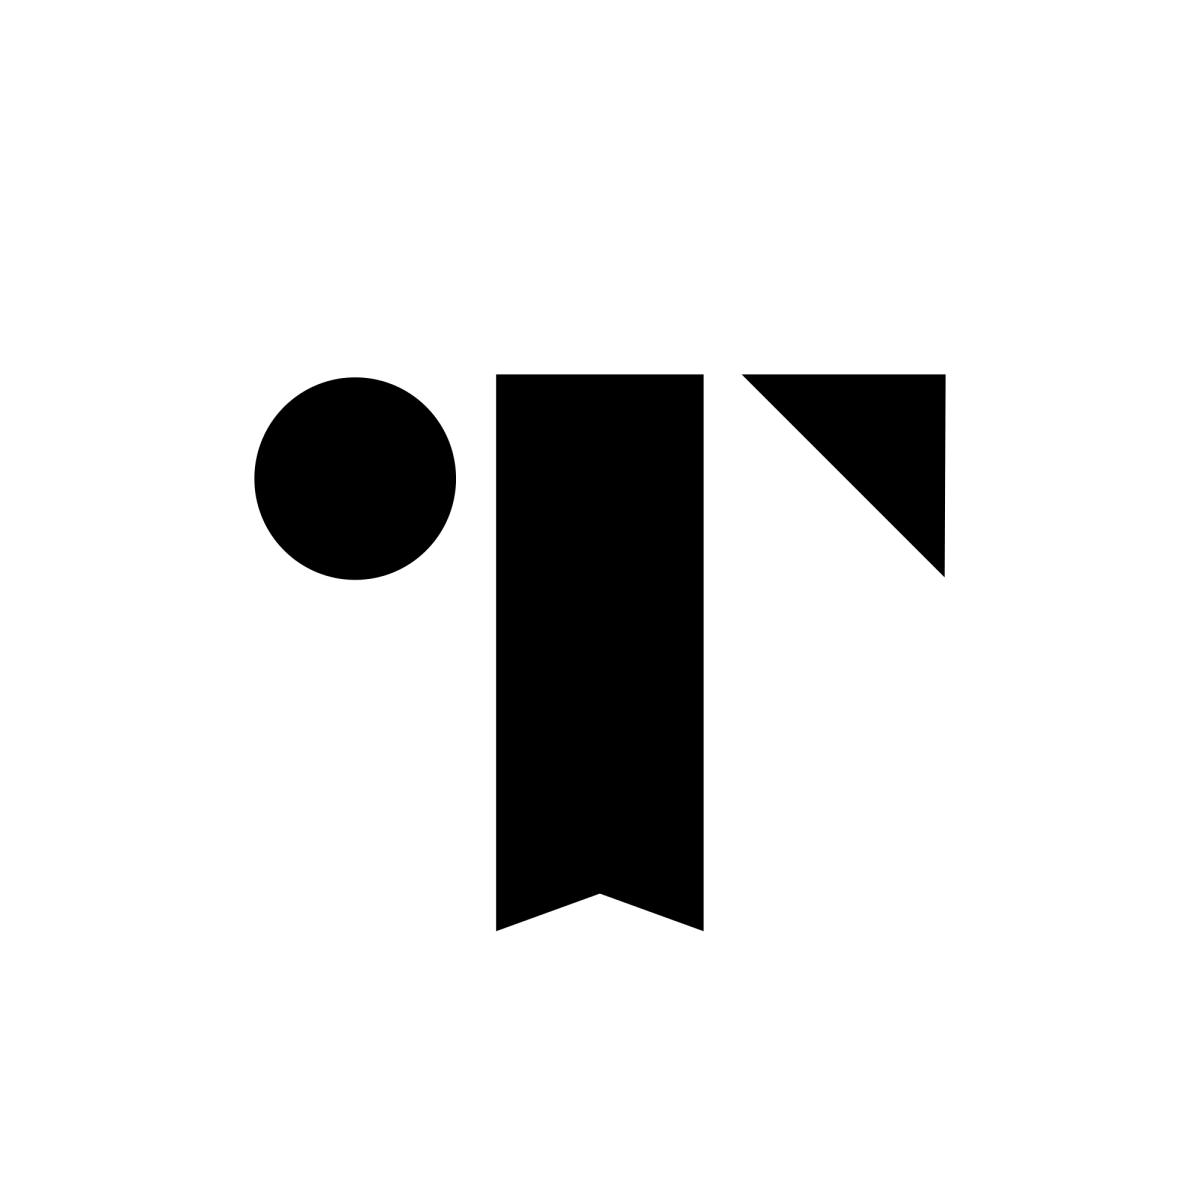 Tapped Brew Logo United Kingdom In 2021 Letter T Lettering Single Letter Logo